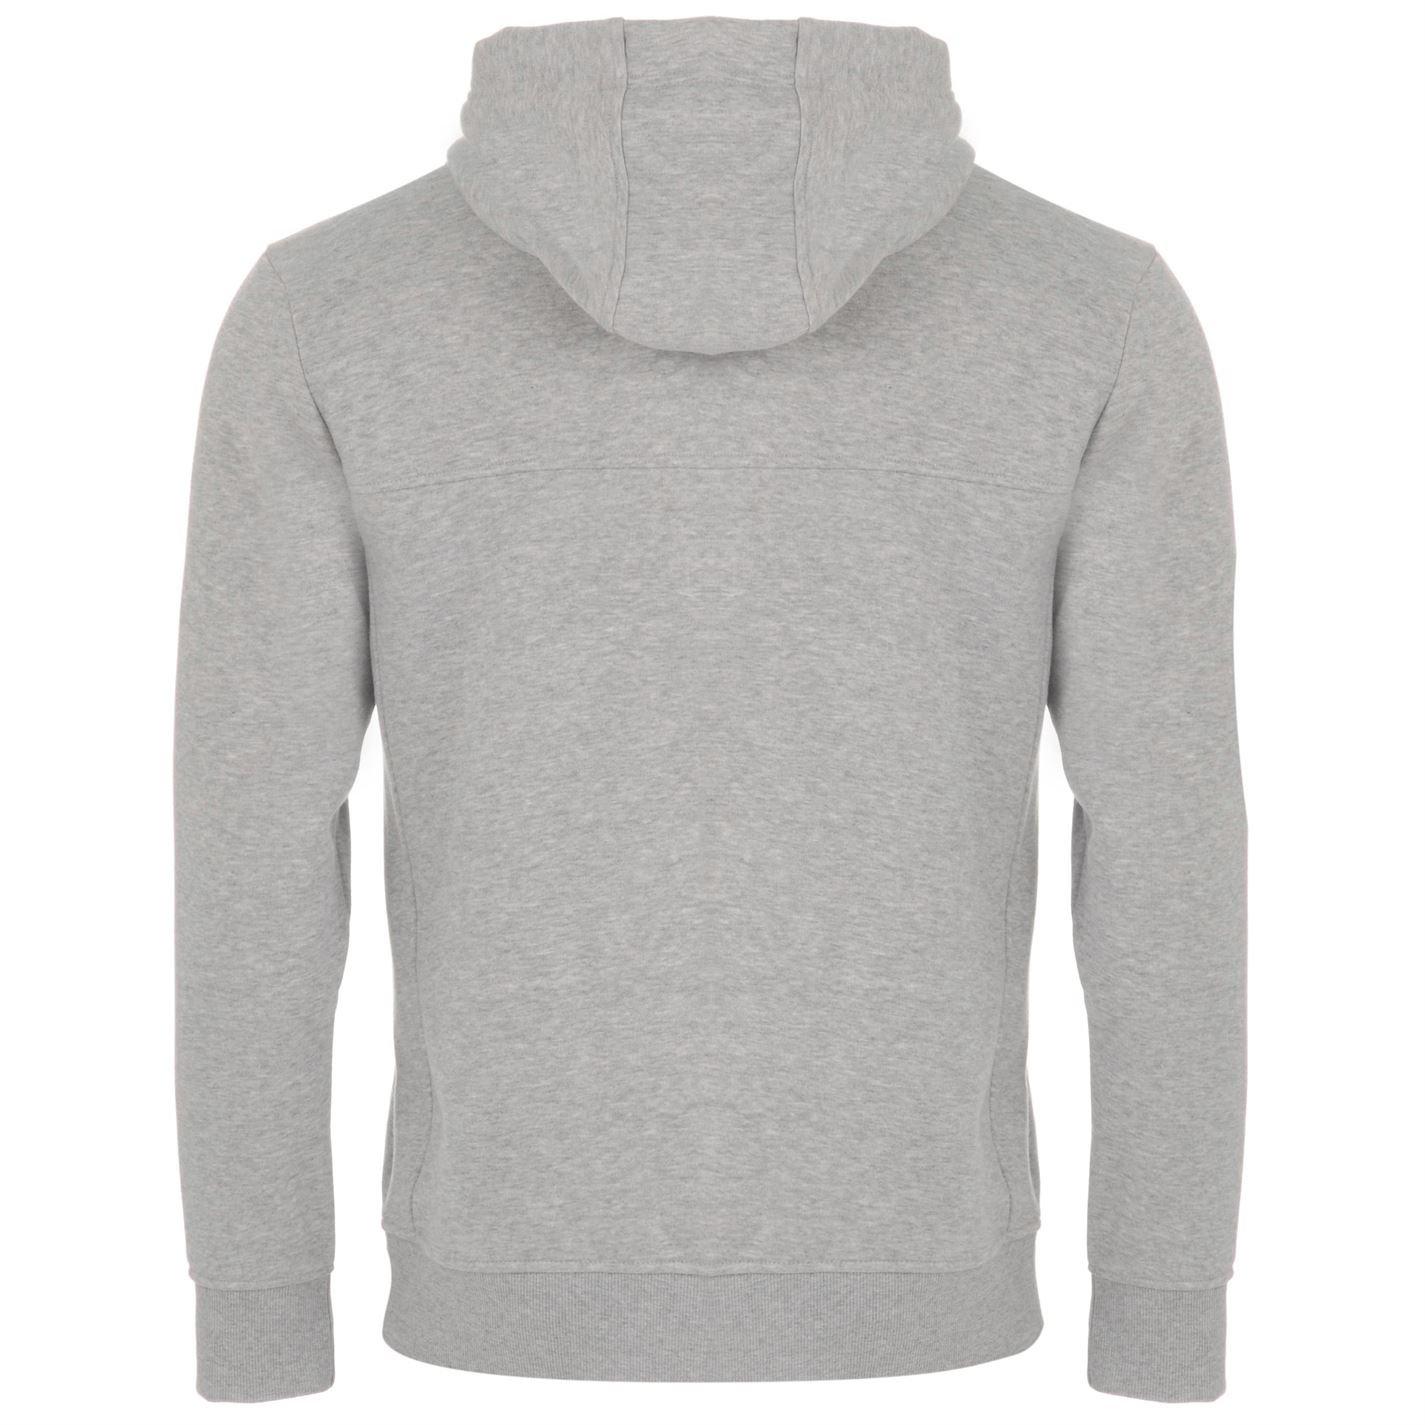 Everlast Mens Zip Hoody Hoodie Hooded Top Full Warm Drawstring Grey Marl XX-Large at Amazon Mens Clothing store: